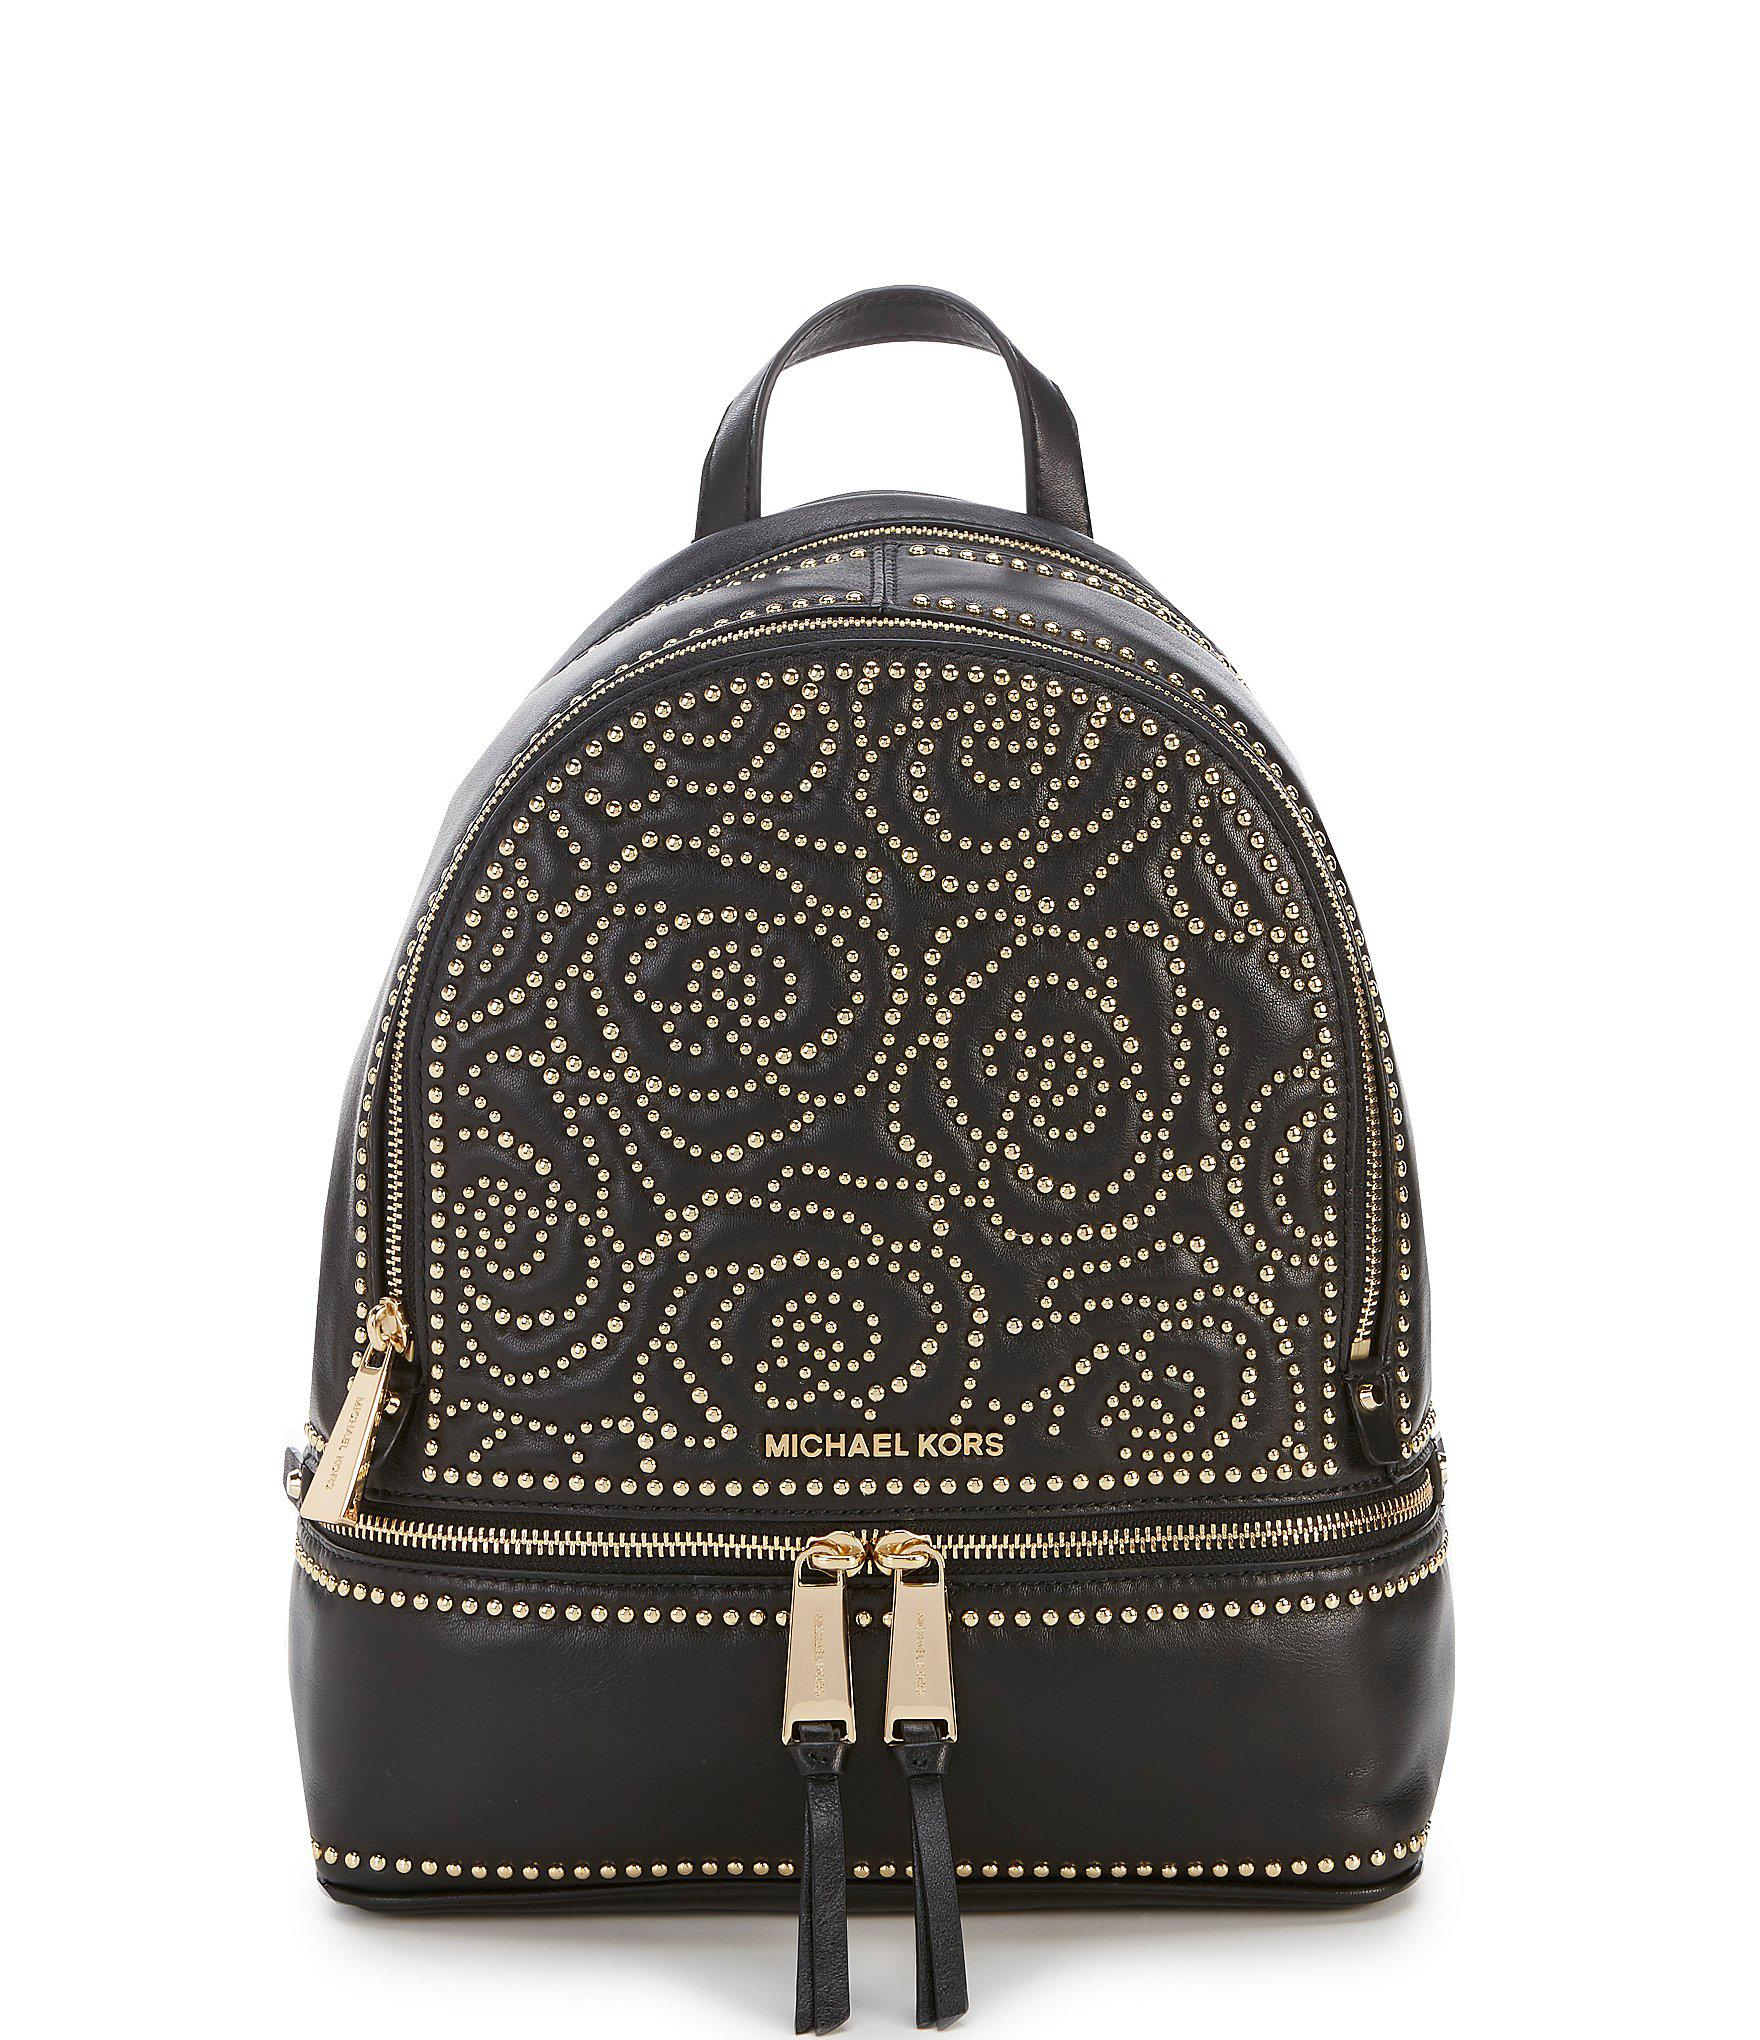 3c73645d6c09 Lyst - MICHAEL Michael Kors Medium Studded Rhea Backpack in Black ...